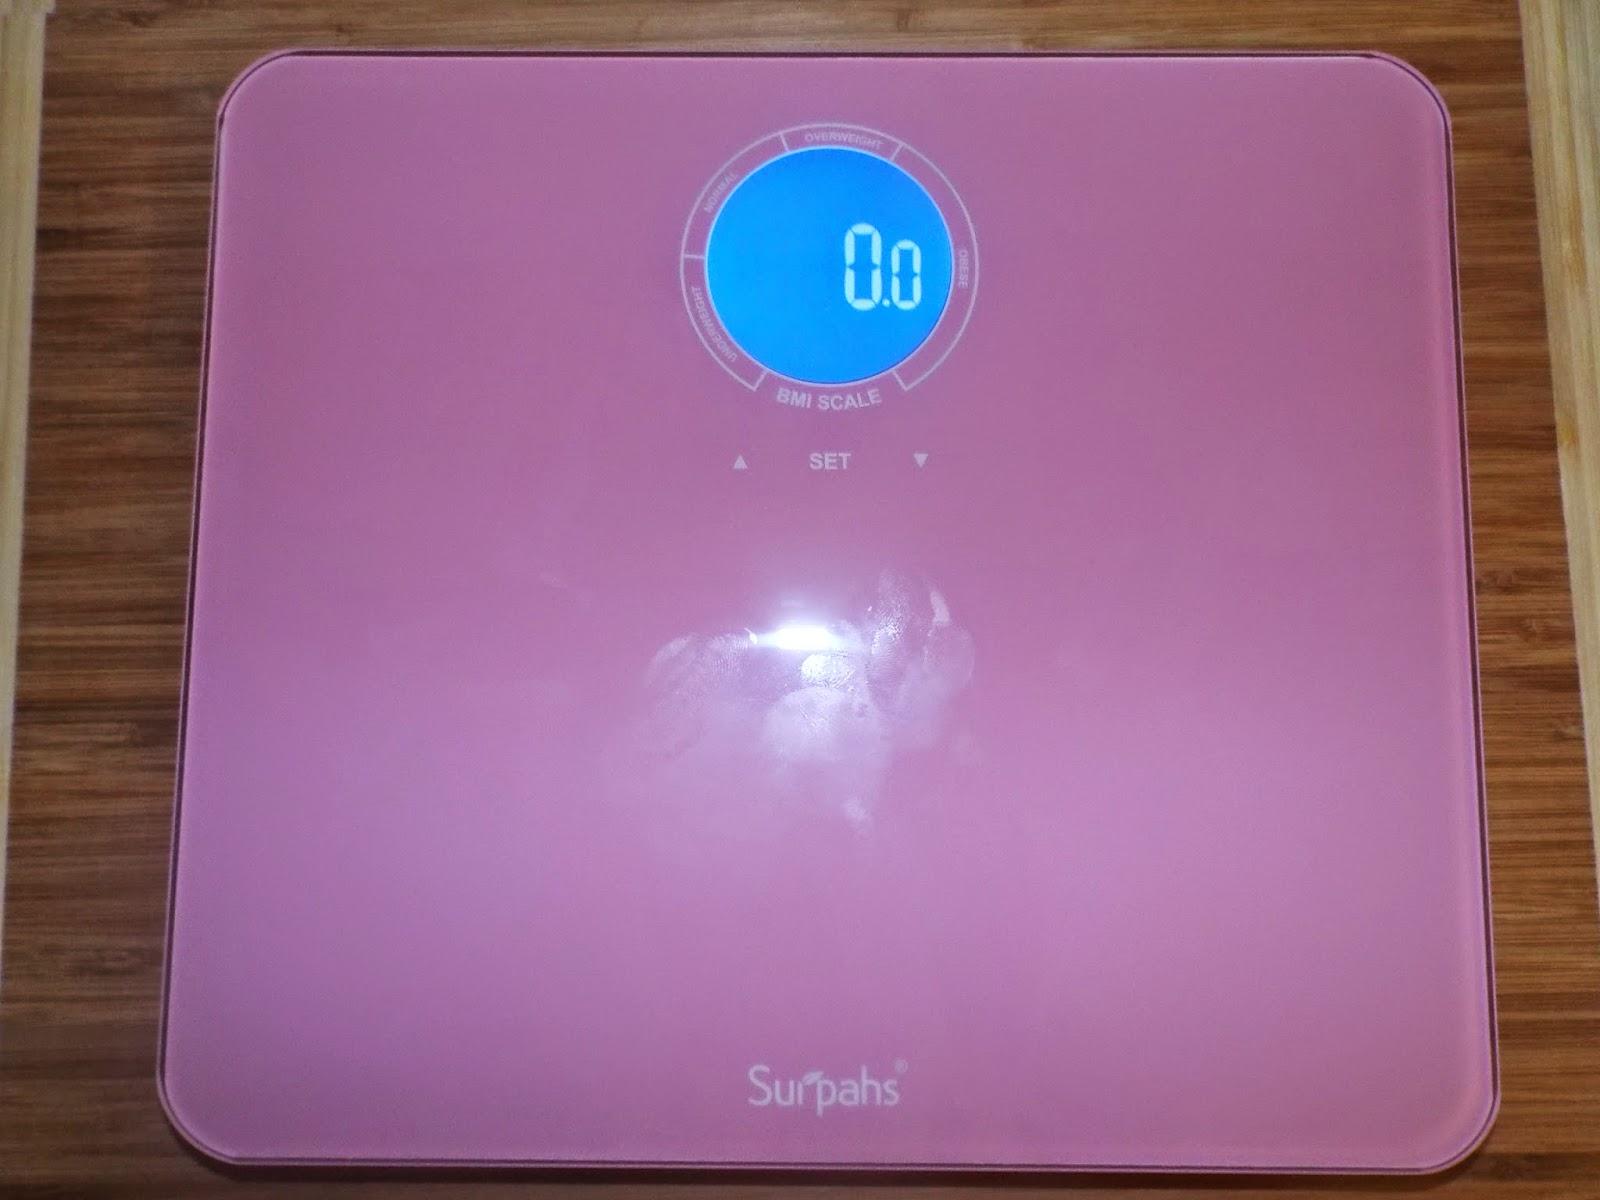 Surpah's Pink Digital Scale: On